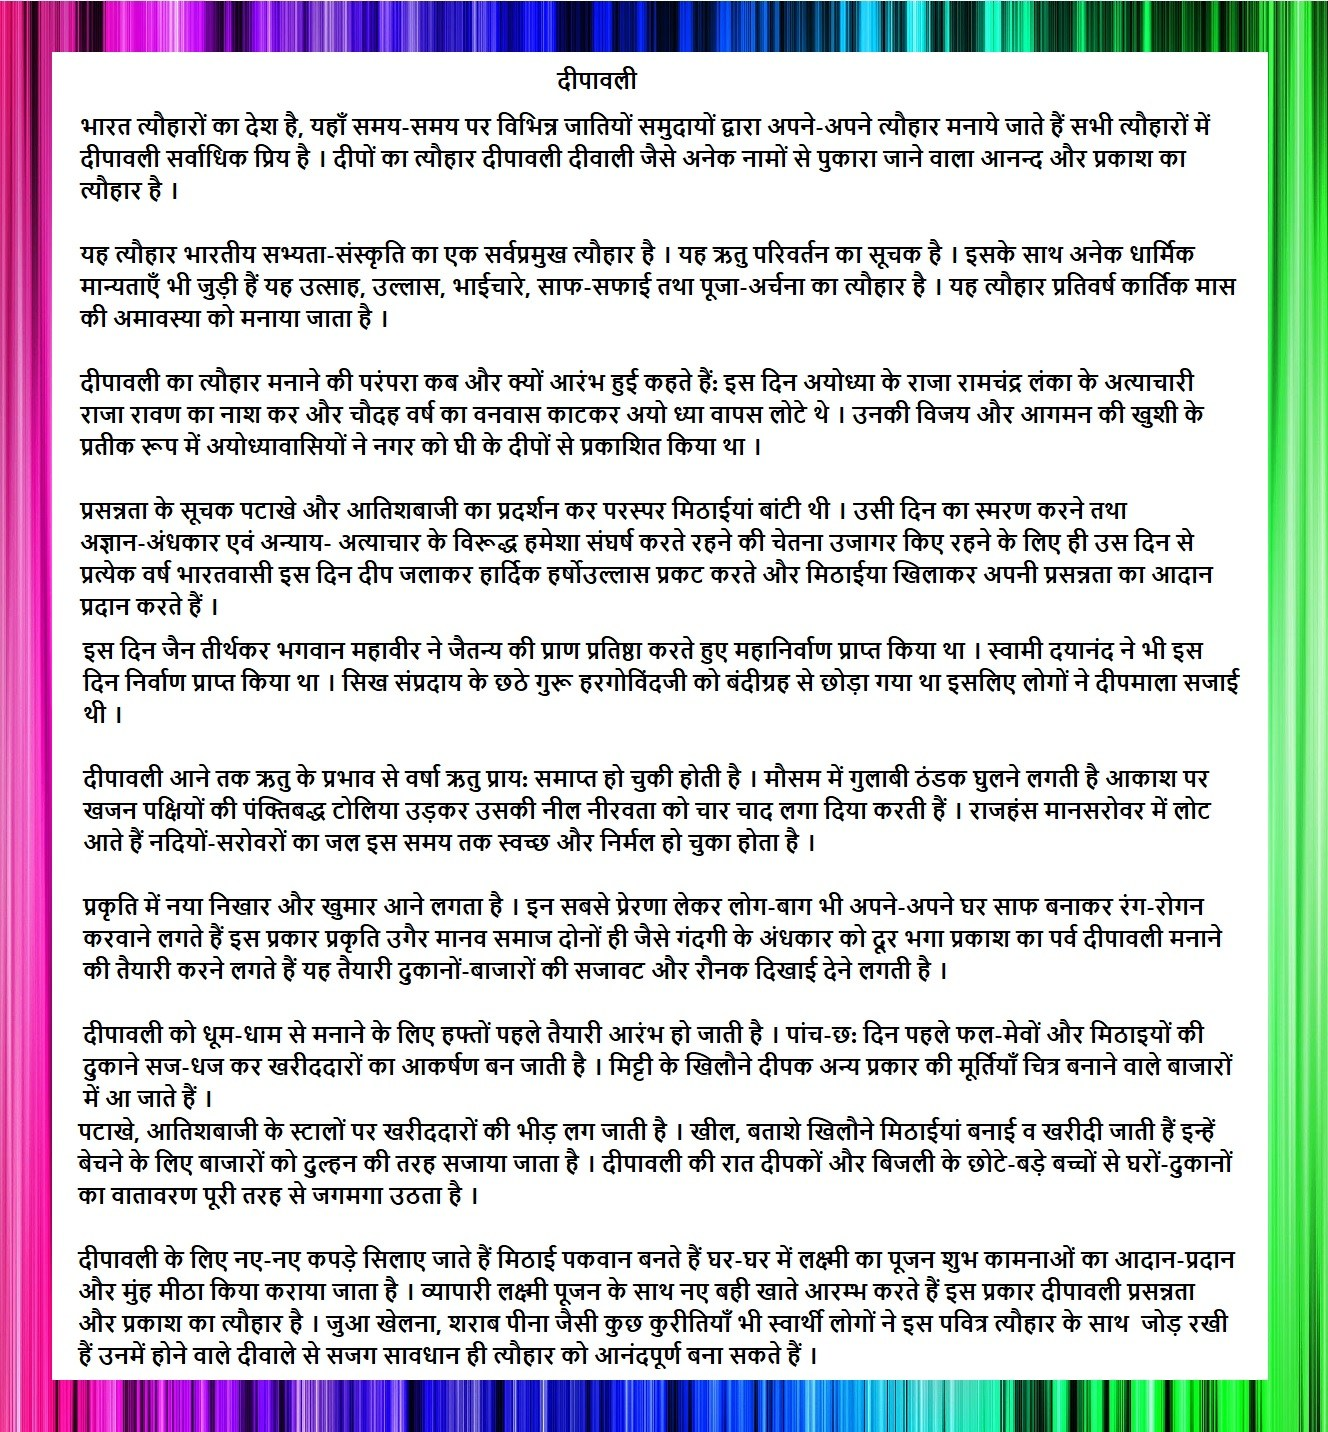 004 Deepavali Festival Essay In Tamil Happy Diwali For School Students Hindiresizeu003d5602c604 Unbelievable Christmas Language Full